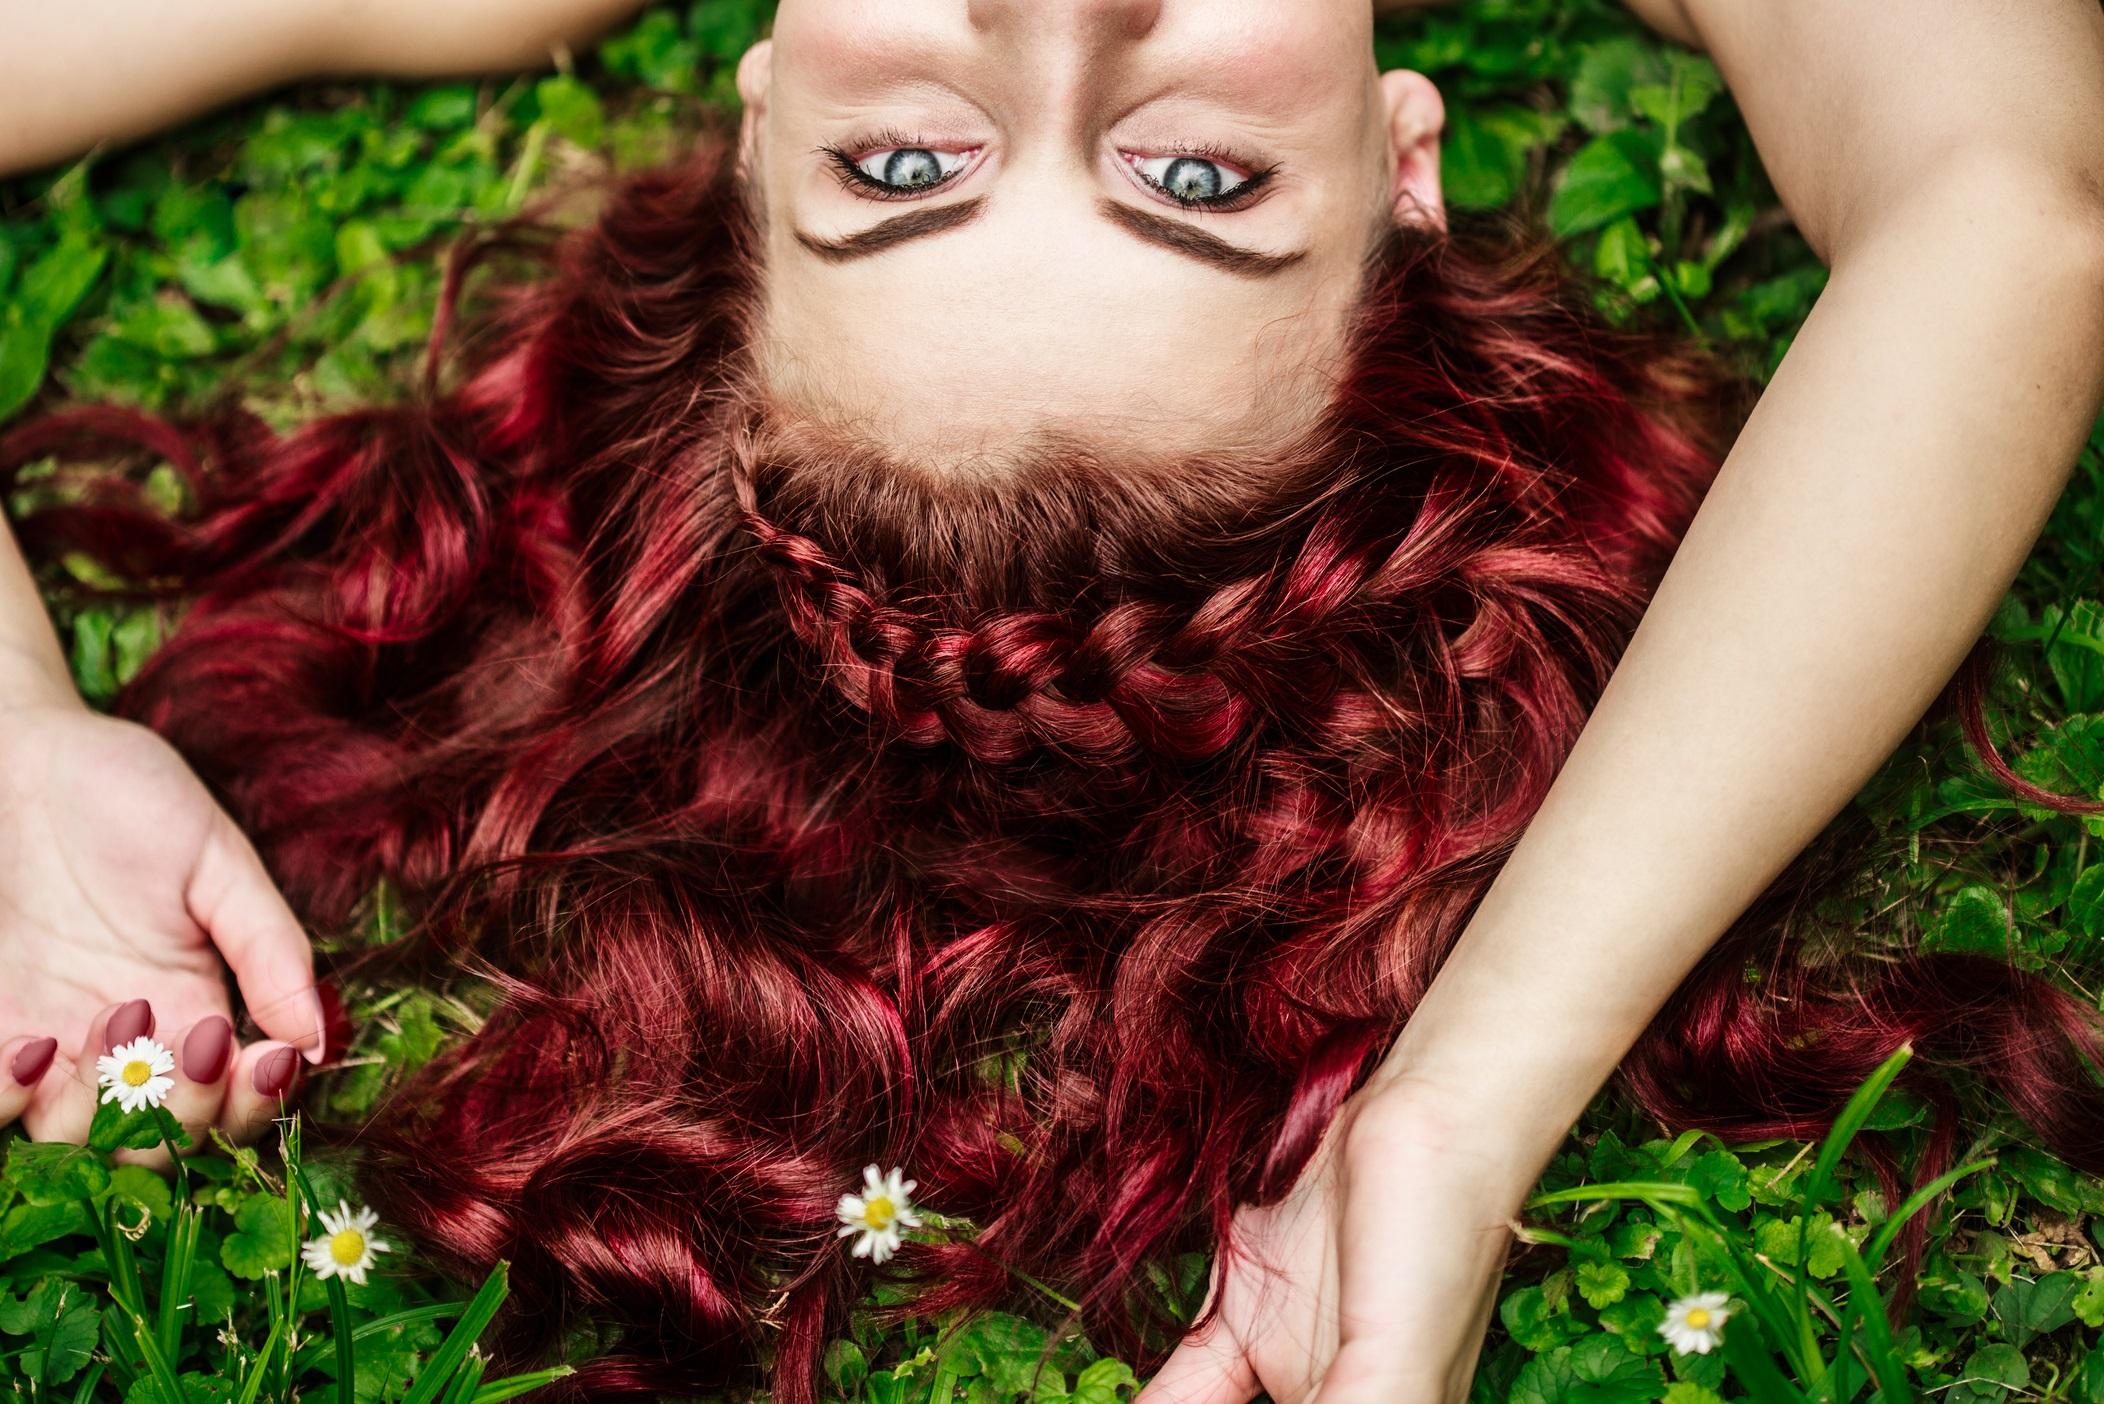 cabelos ruivos 1 1 - Tudo o que você sempre quis saber sobre cabelos ruivos